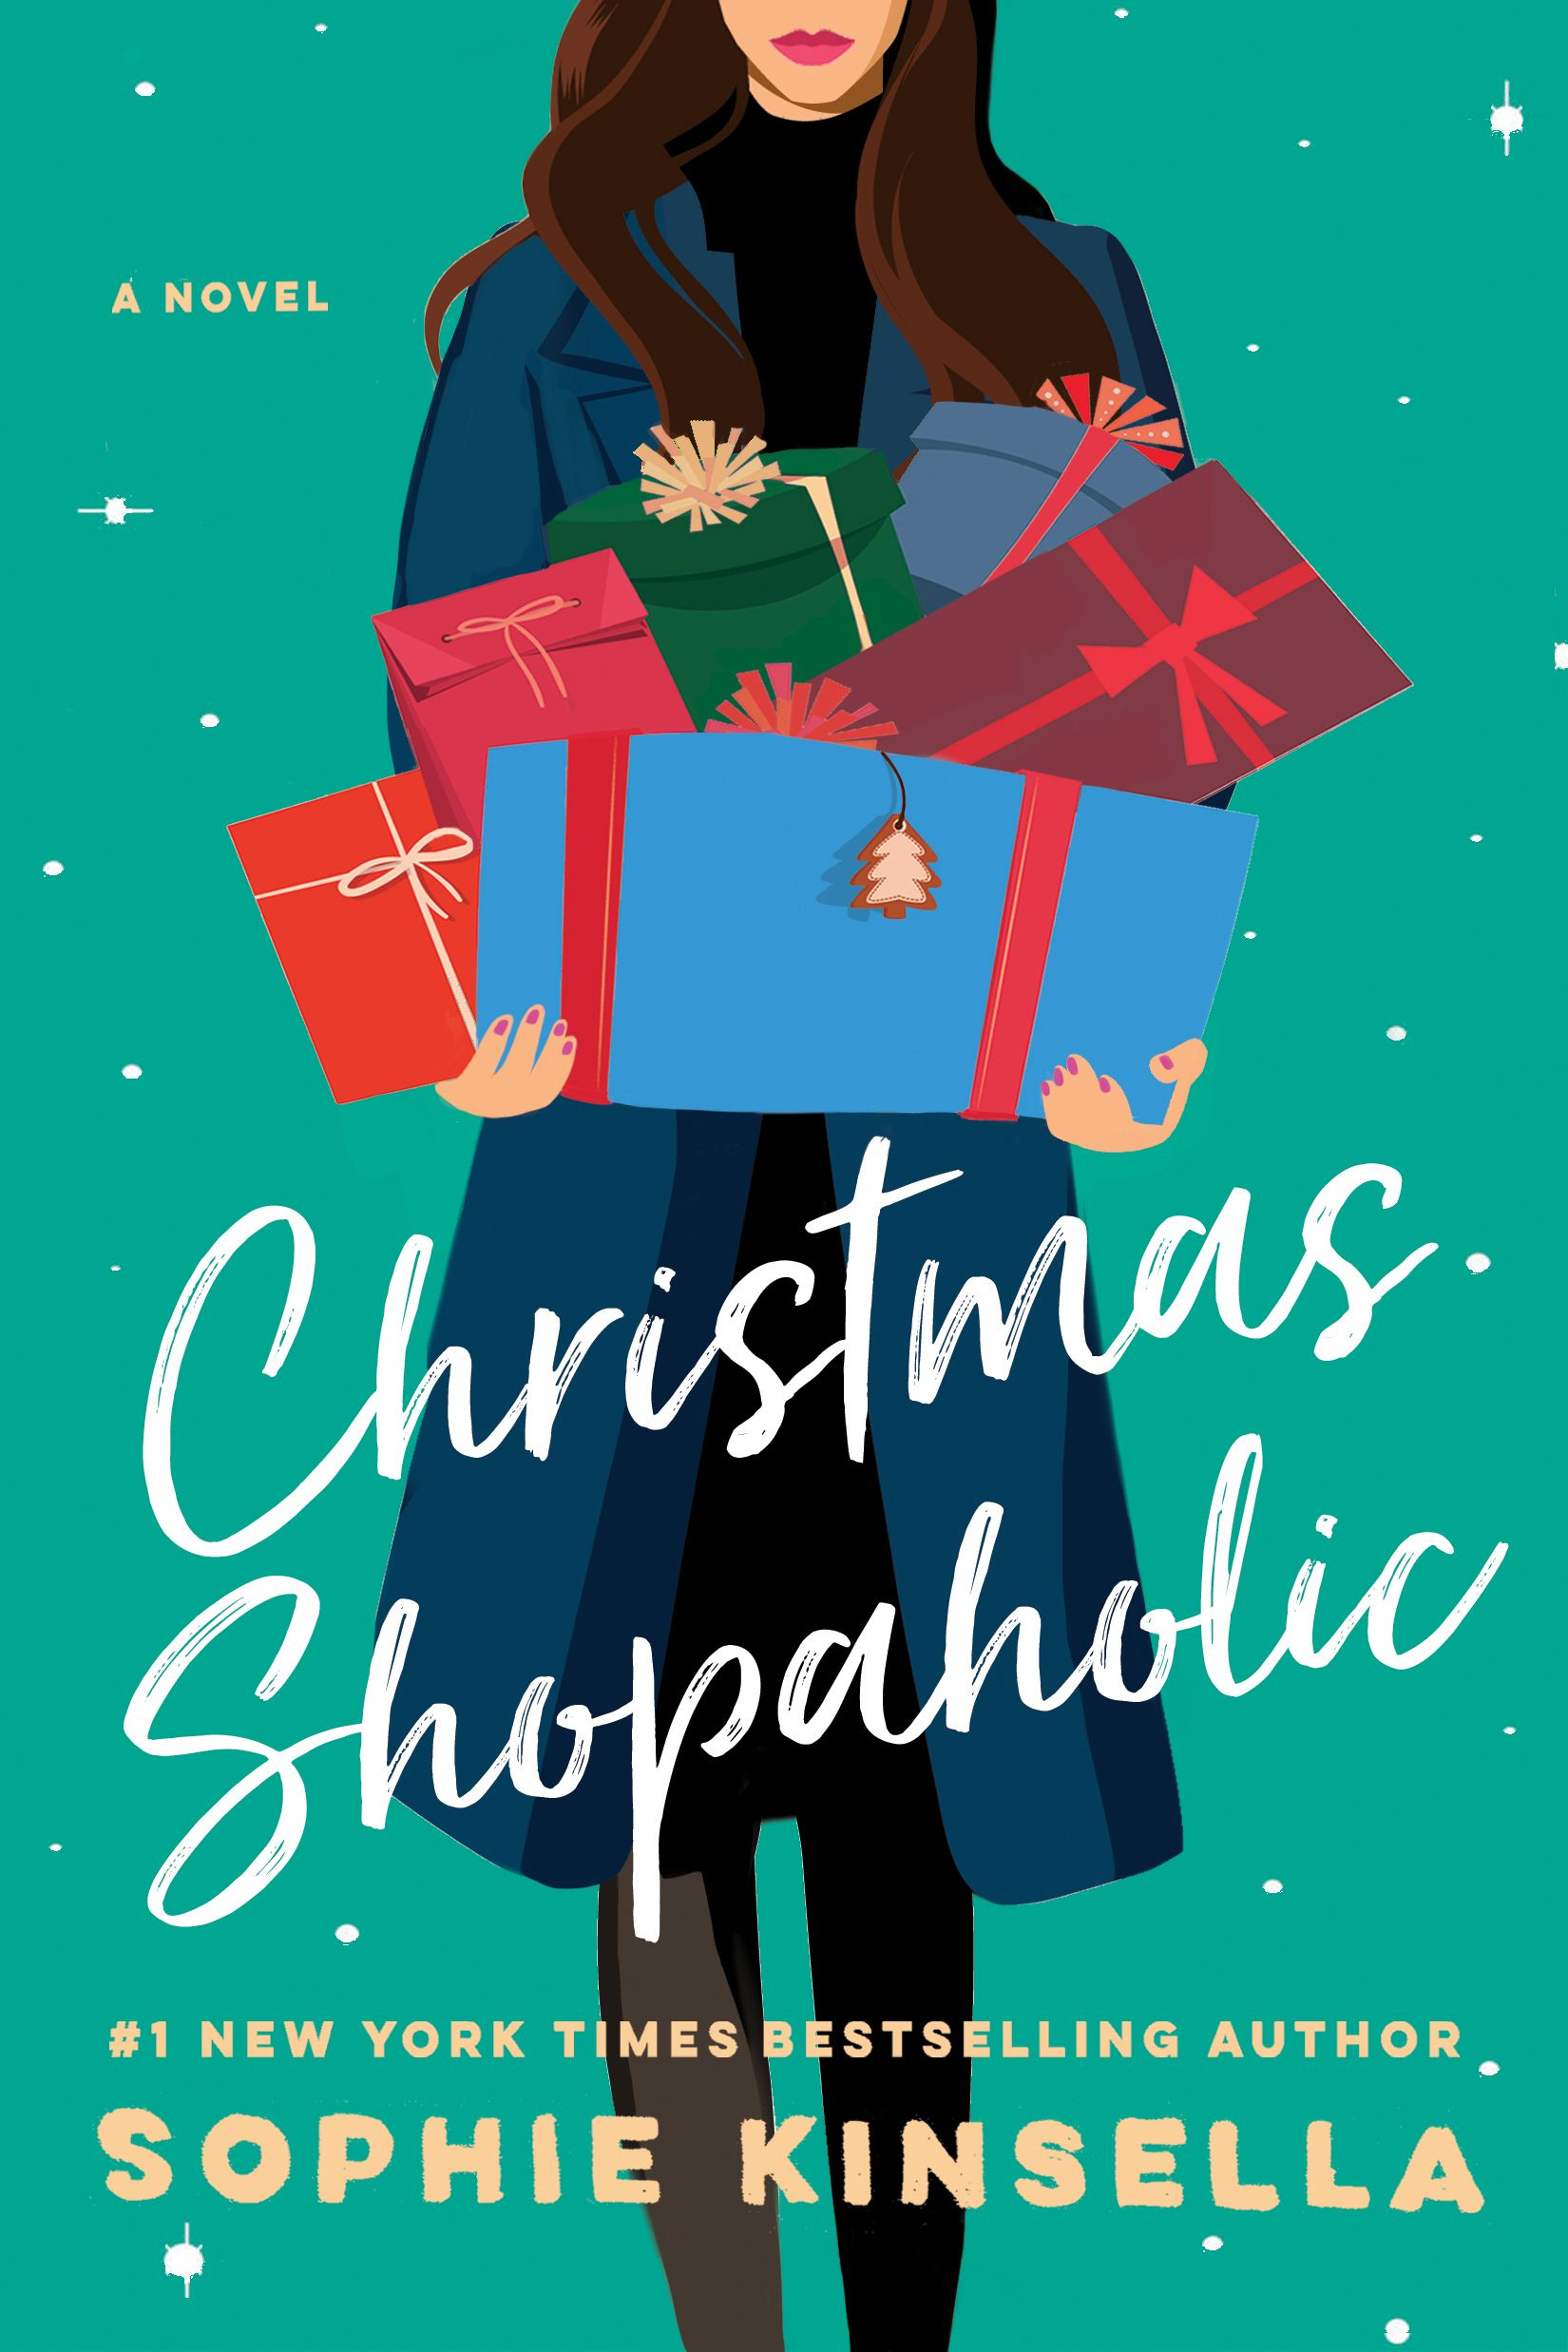 Book Christmas Shopaholic By Sophie Kinsella Sophie Kinsella Christmas Books Novels